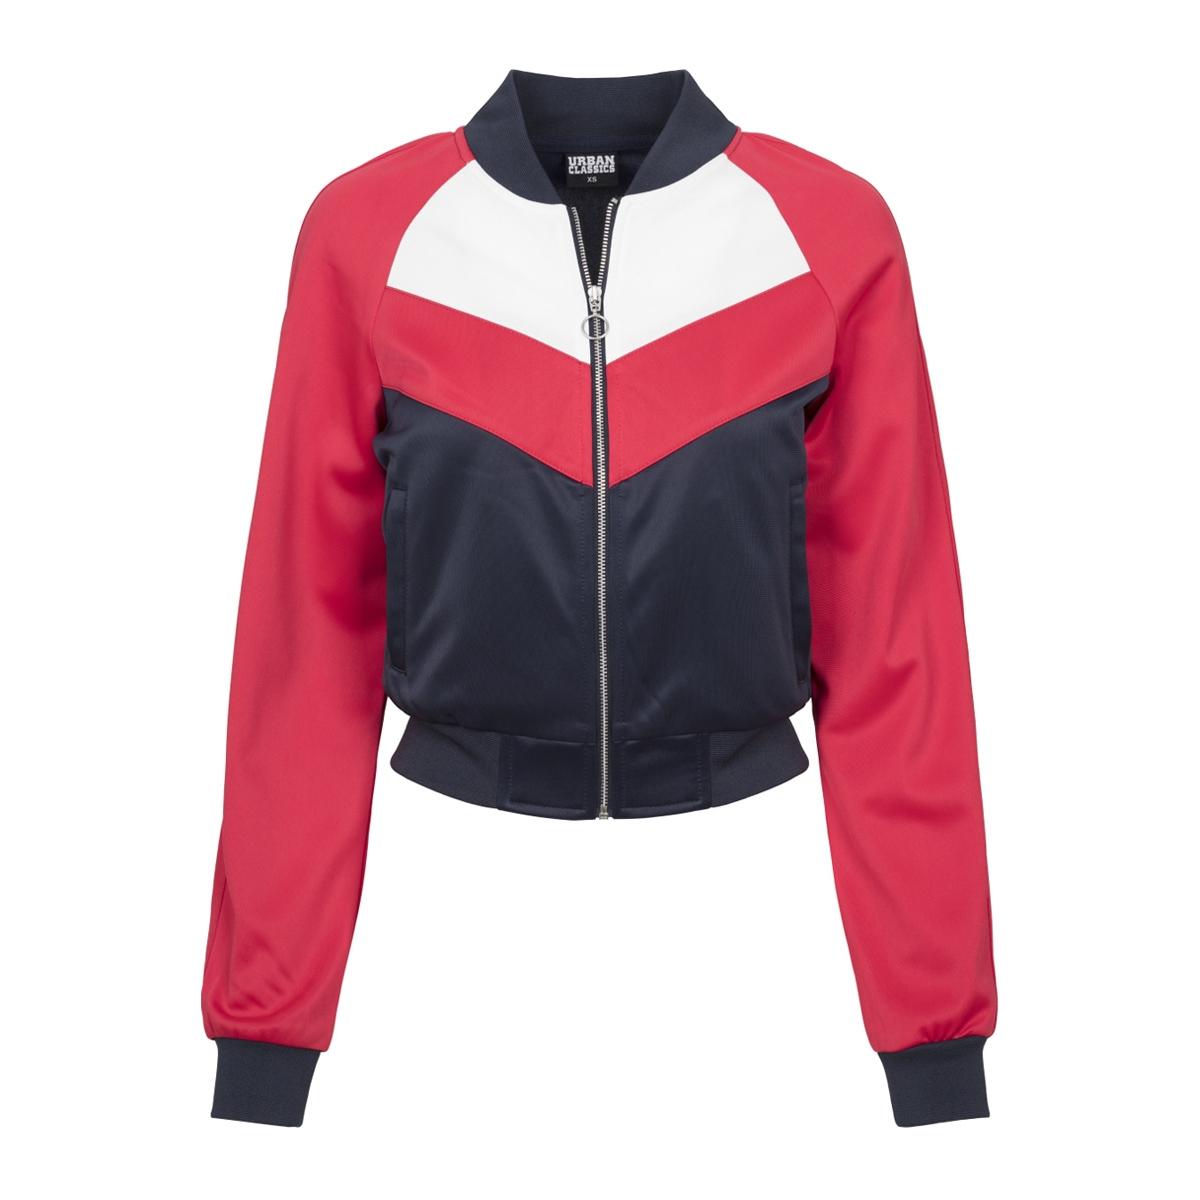 tb1856 short raglan track urban classics jas navy/red